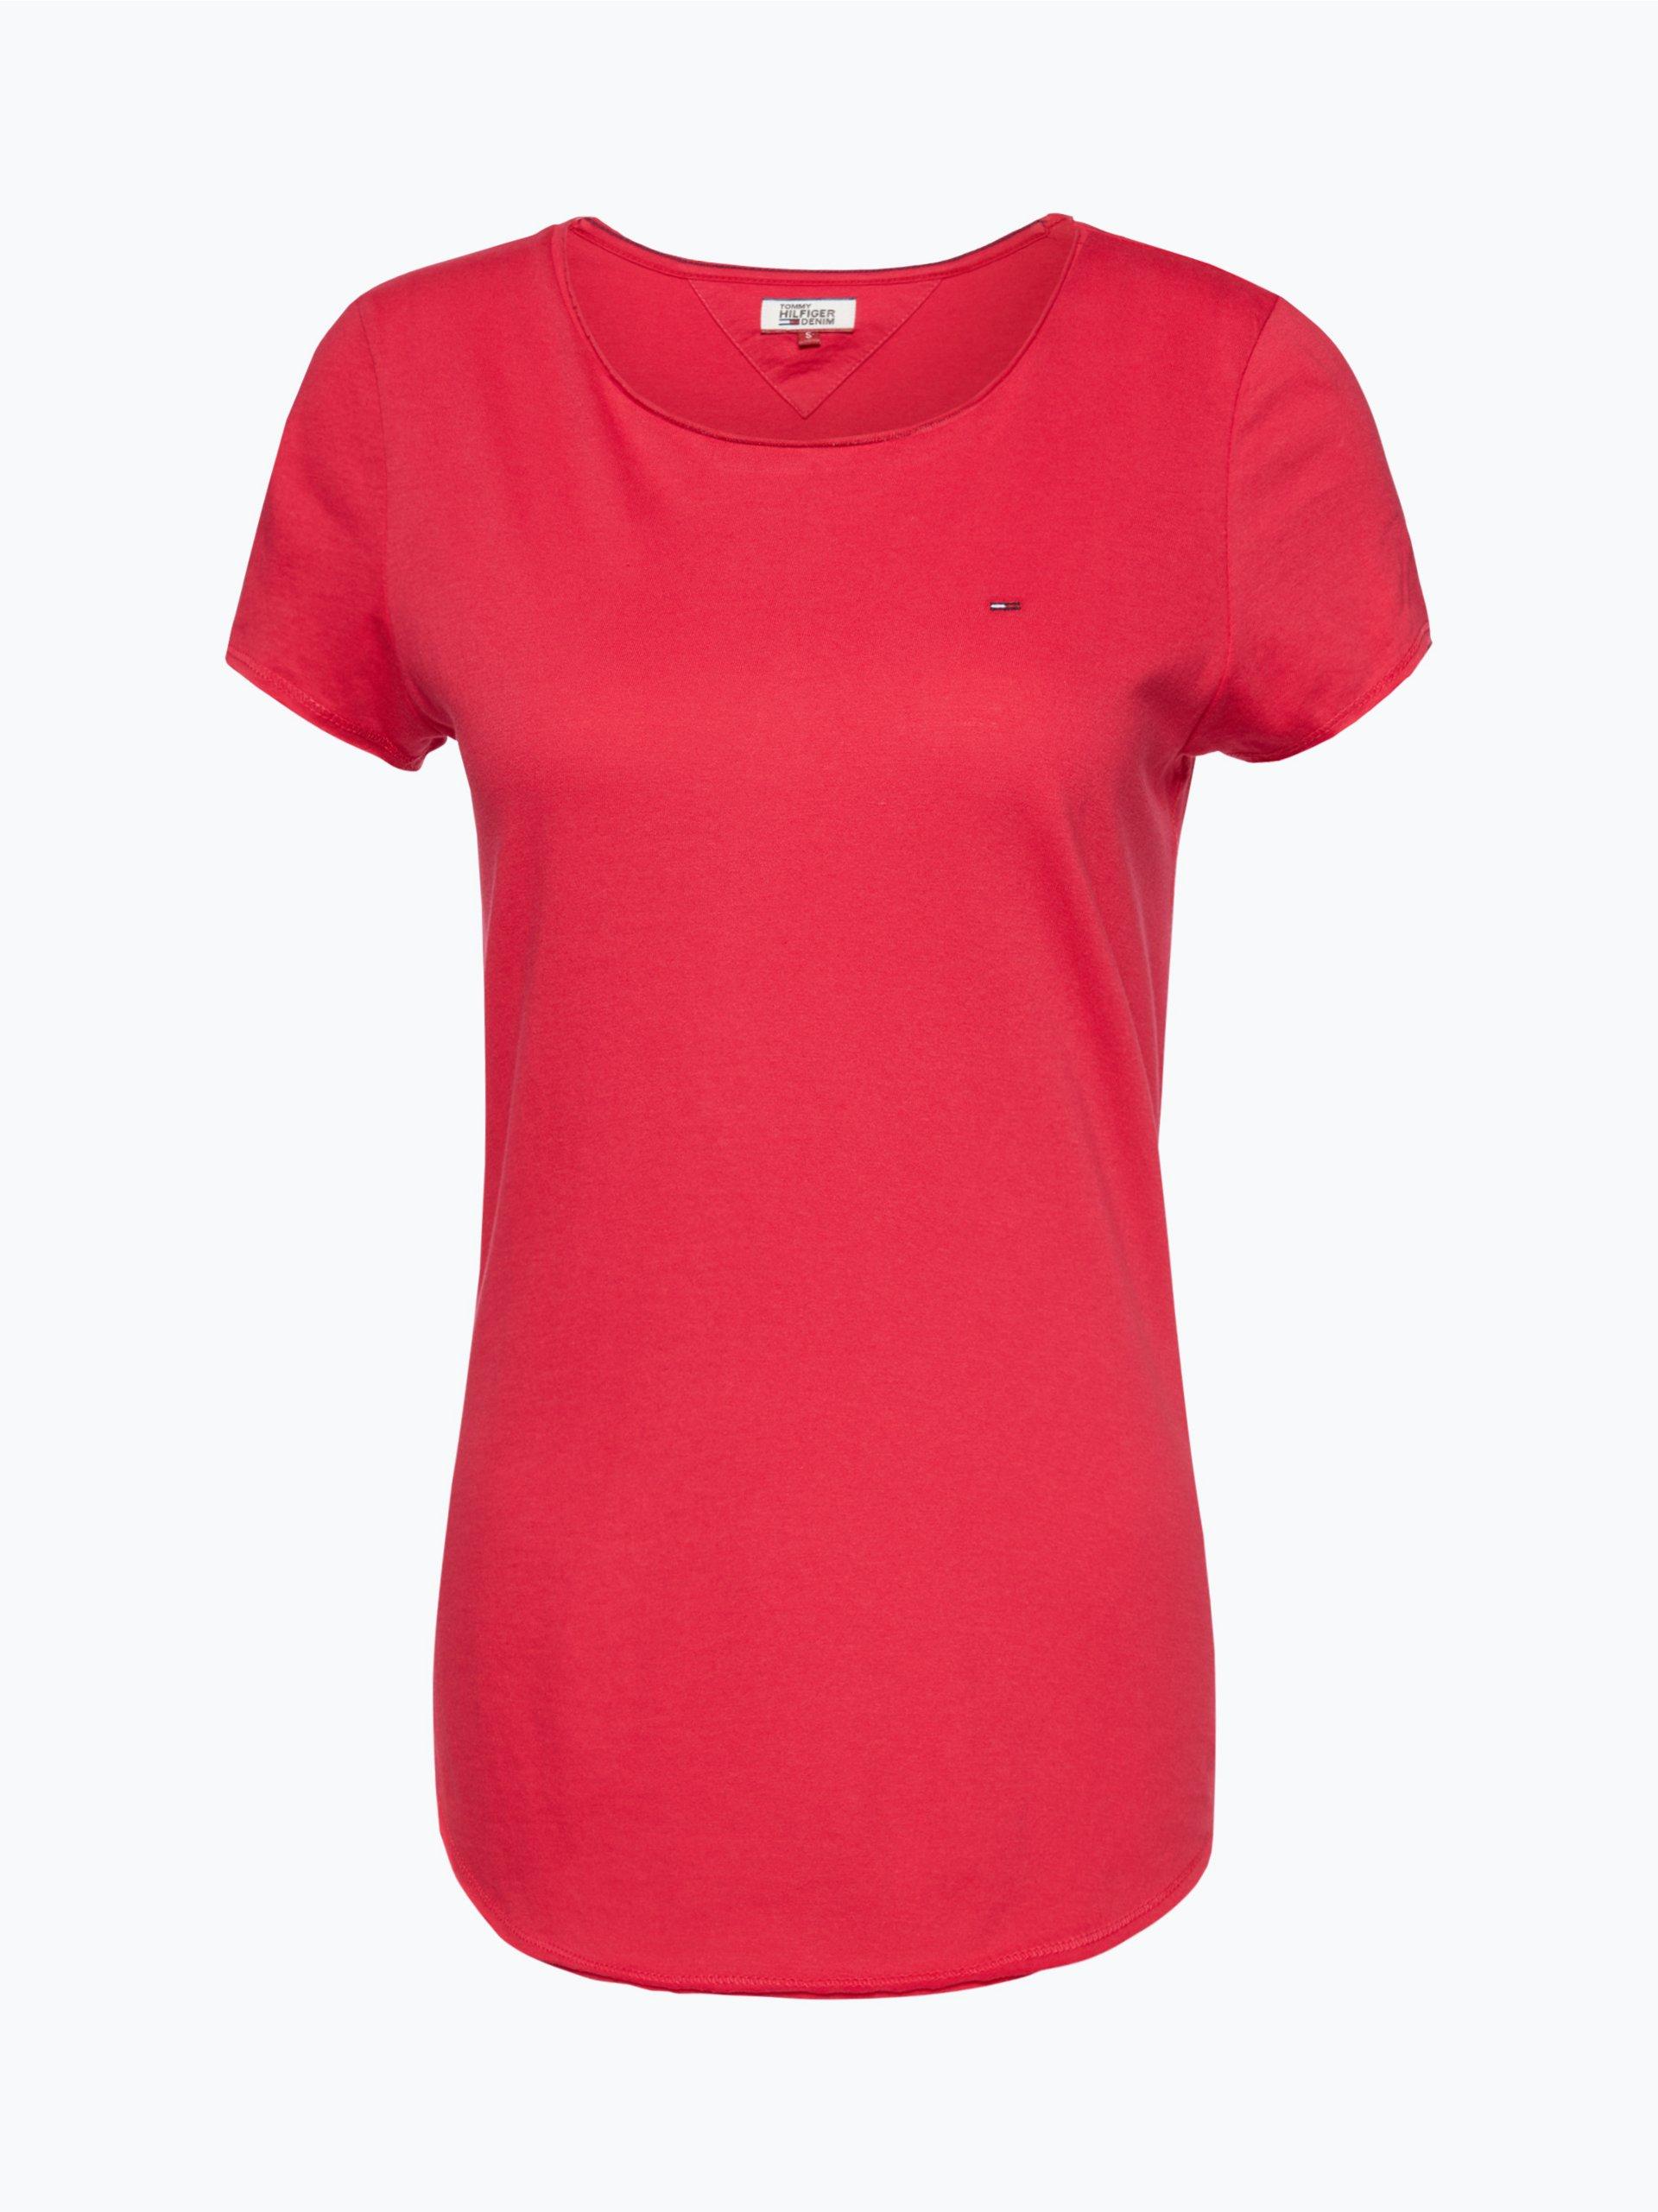 tommy jeans damen t shirt rosa uni online kaufen peek. Black Bedroom Furniture Sets. Home Design Ideas